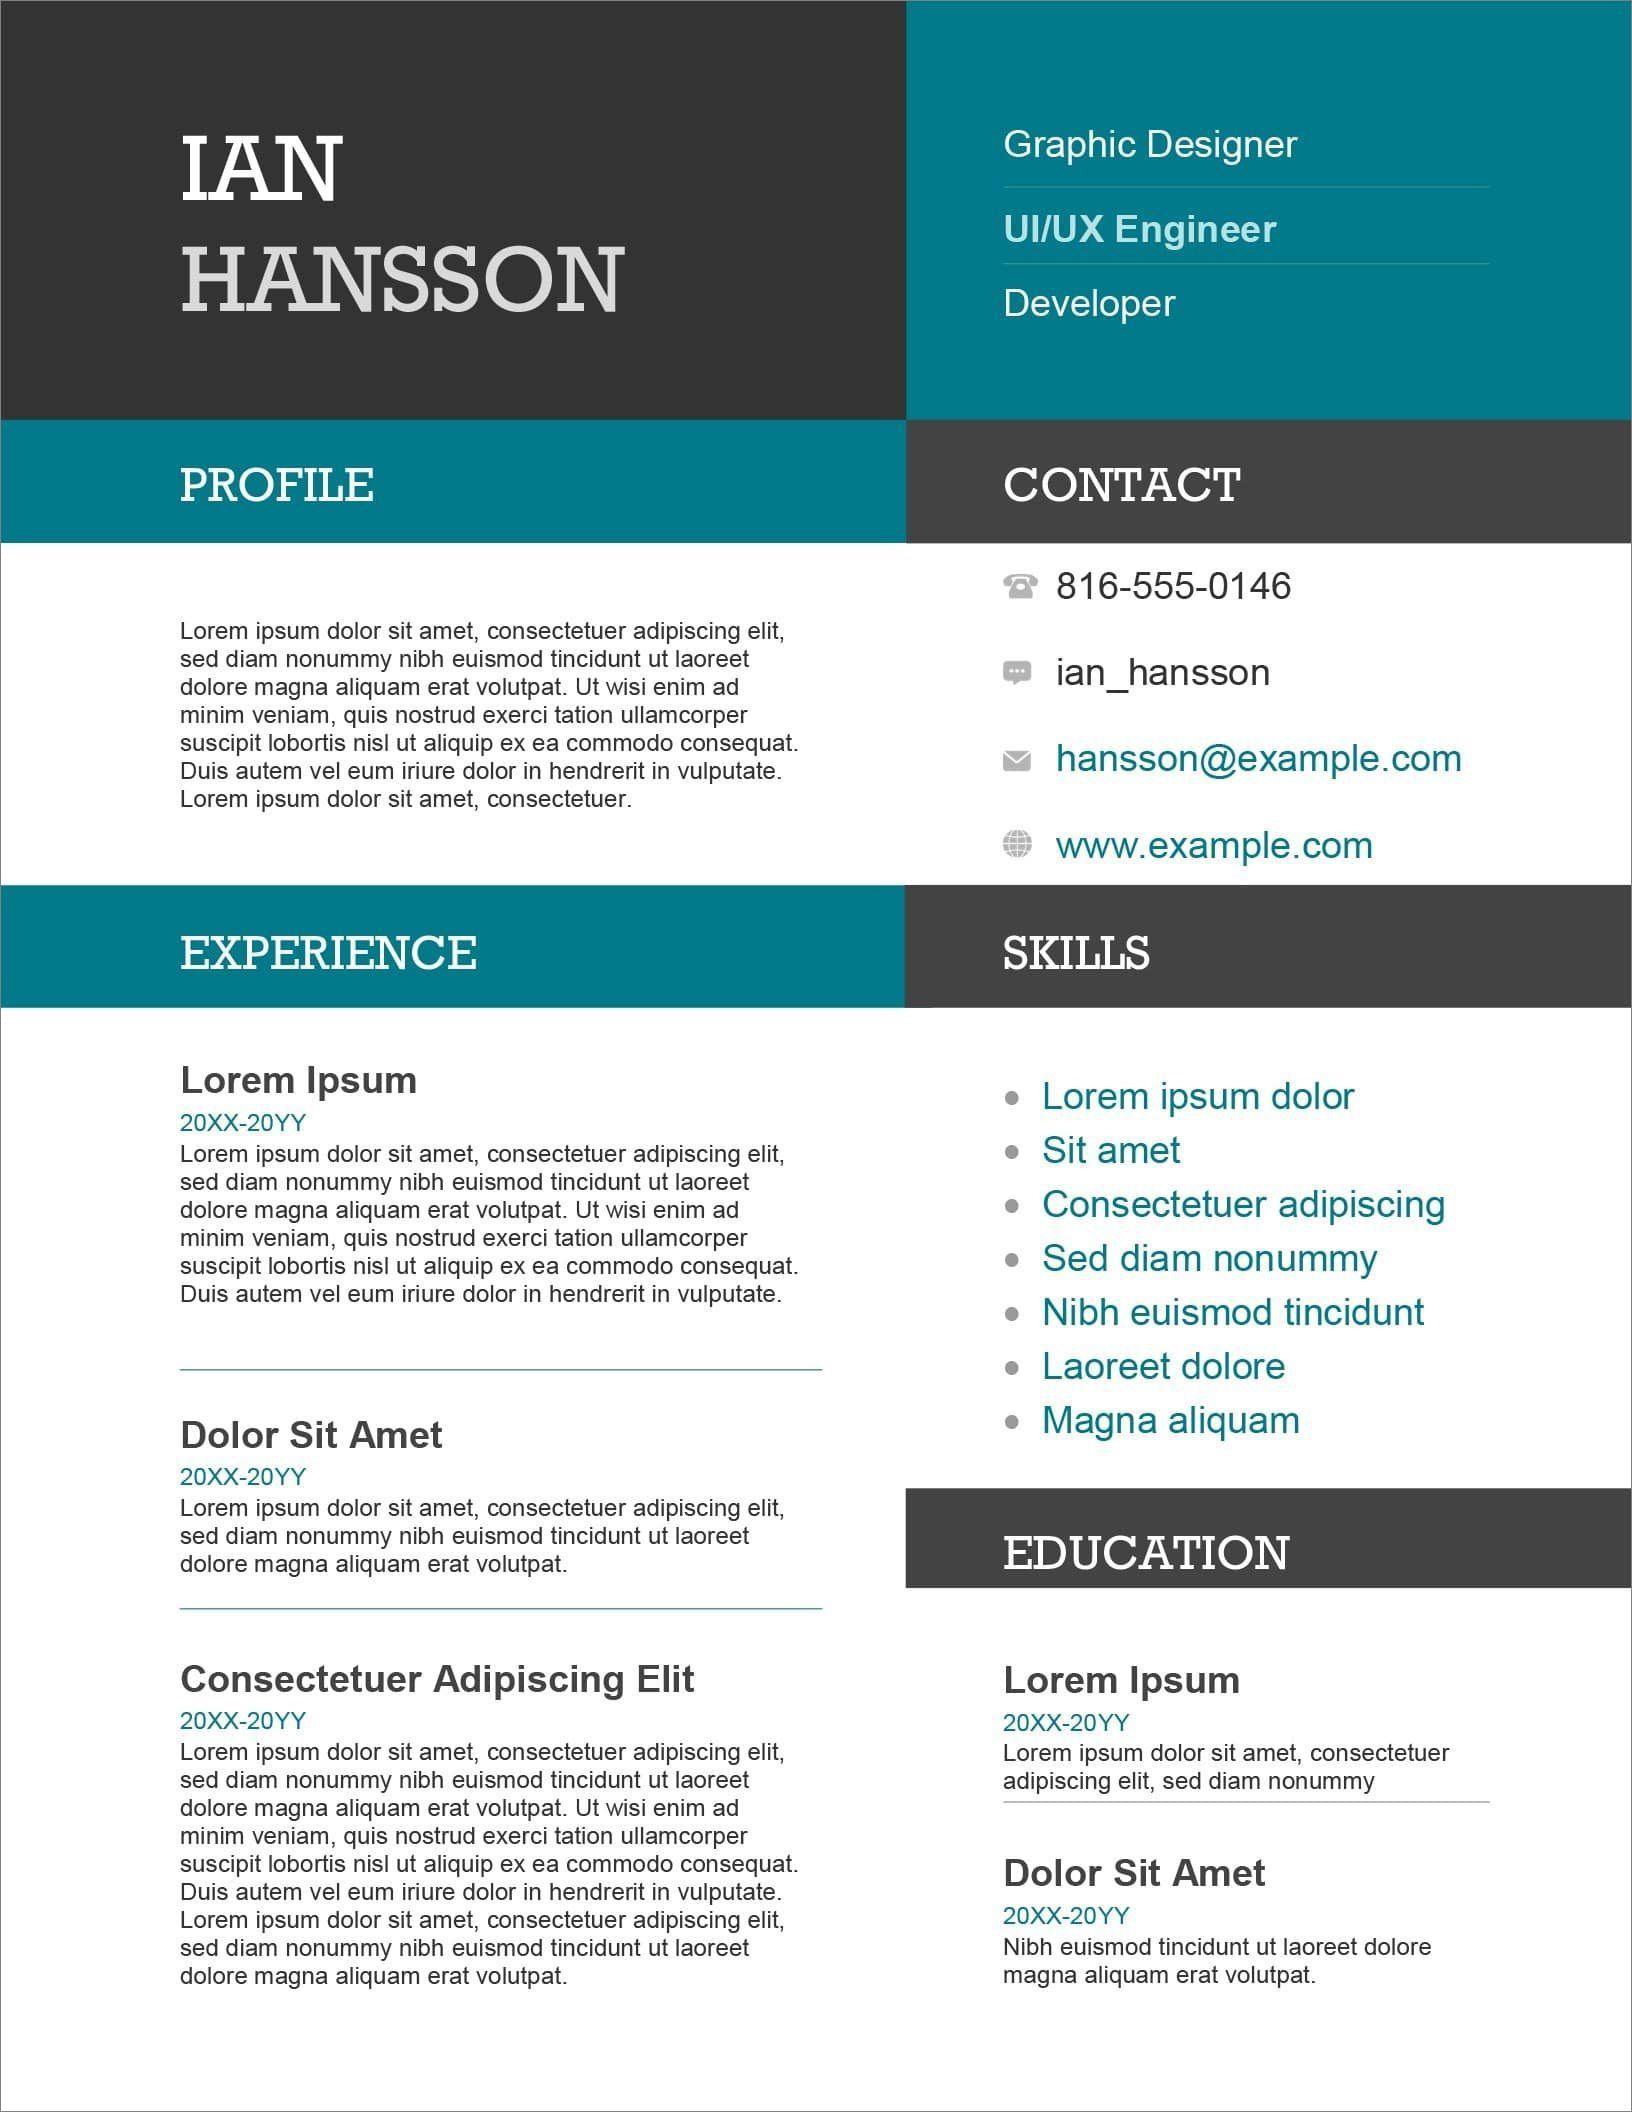 003 Remarkable Resume Template On Microsoft Word Example  Sample 2007 Cv 2010Full